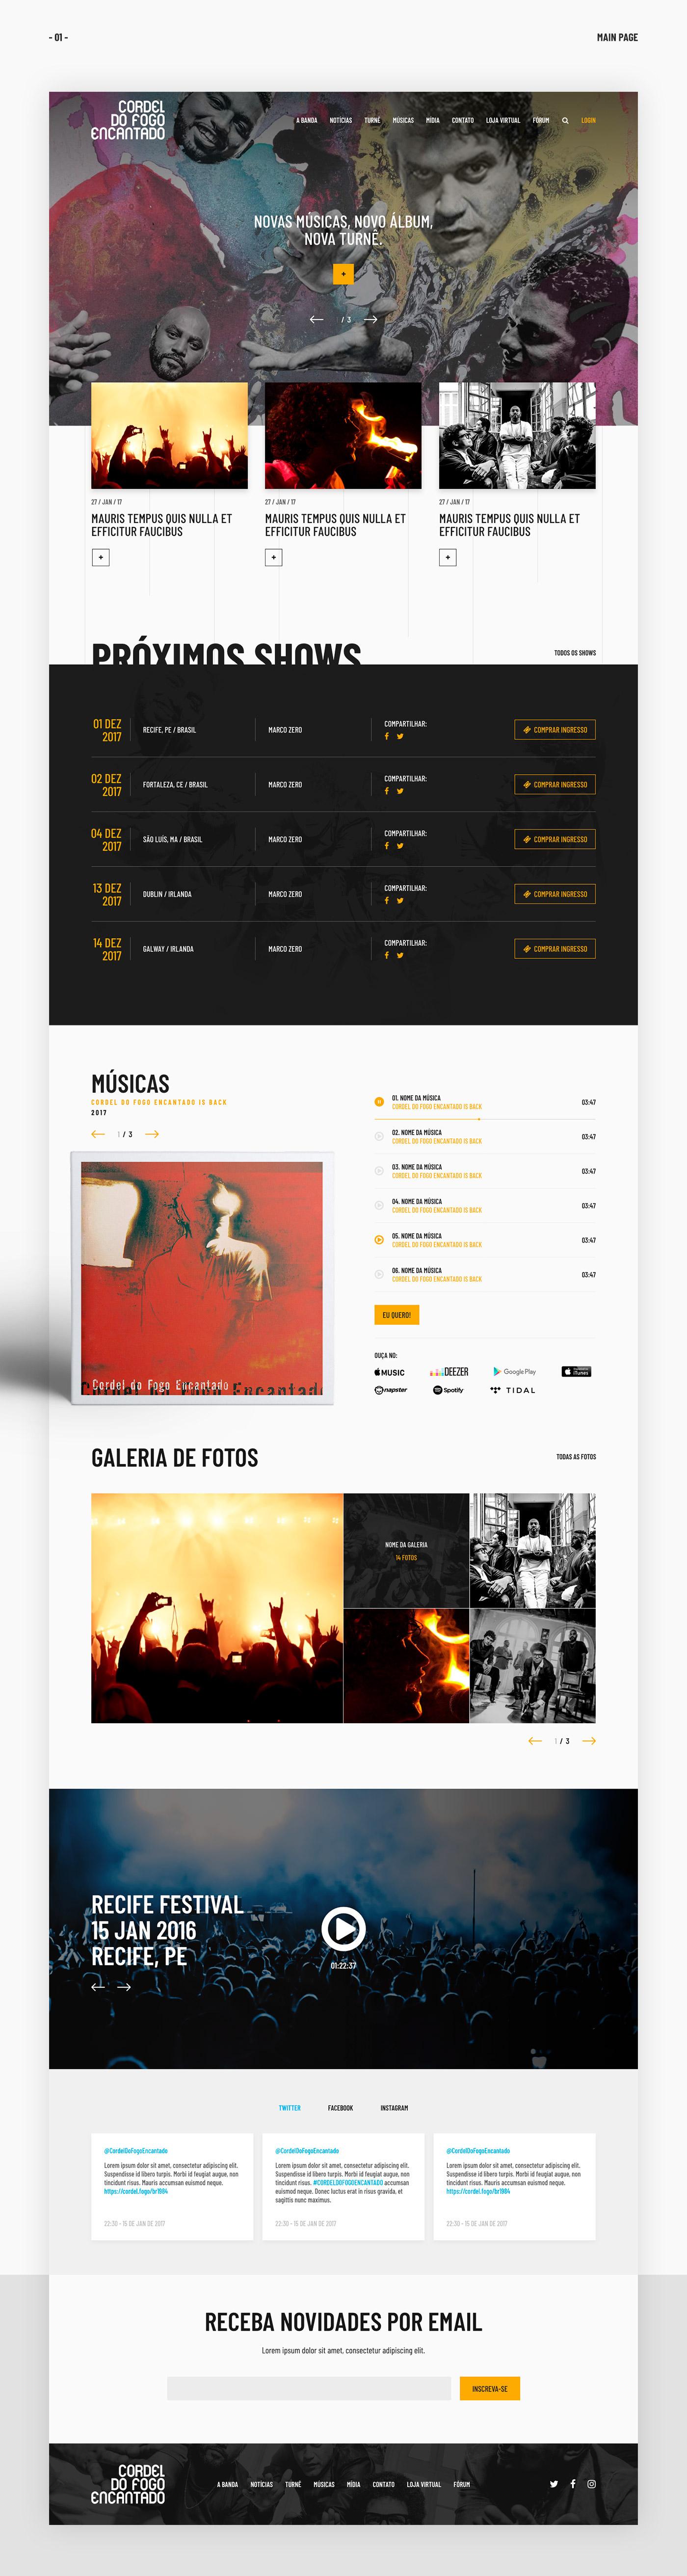 #UI #UX #UI/UX  #Design #web   #CordelDoFogoEncantado #band #music #AdobeXD